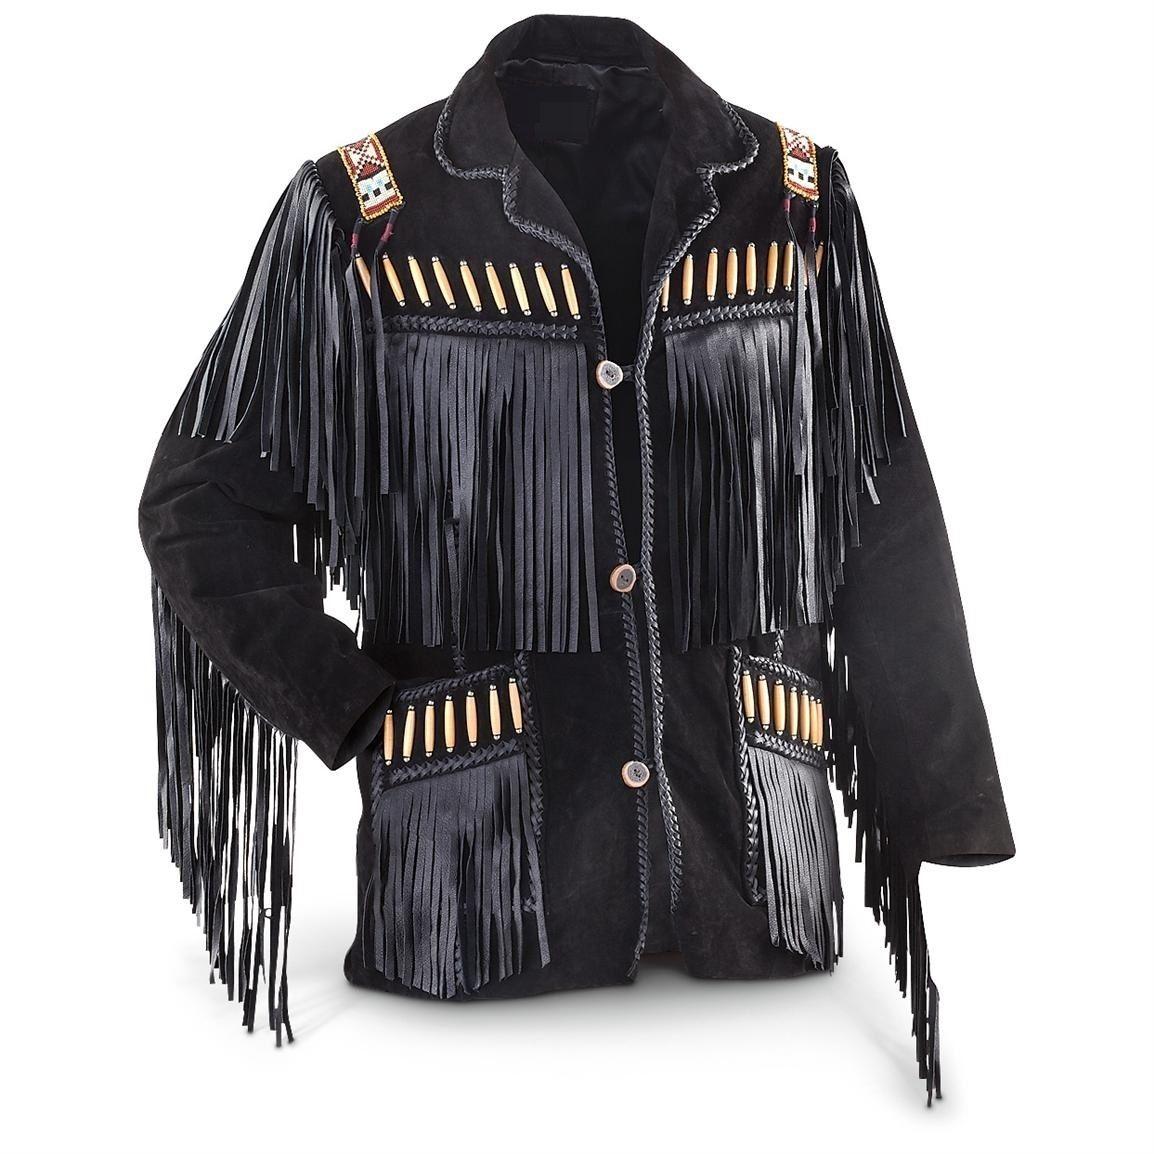 New Handmade Men's Black Western Cowboy Fringes Genuine